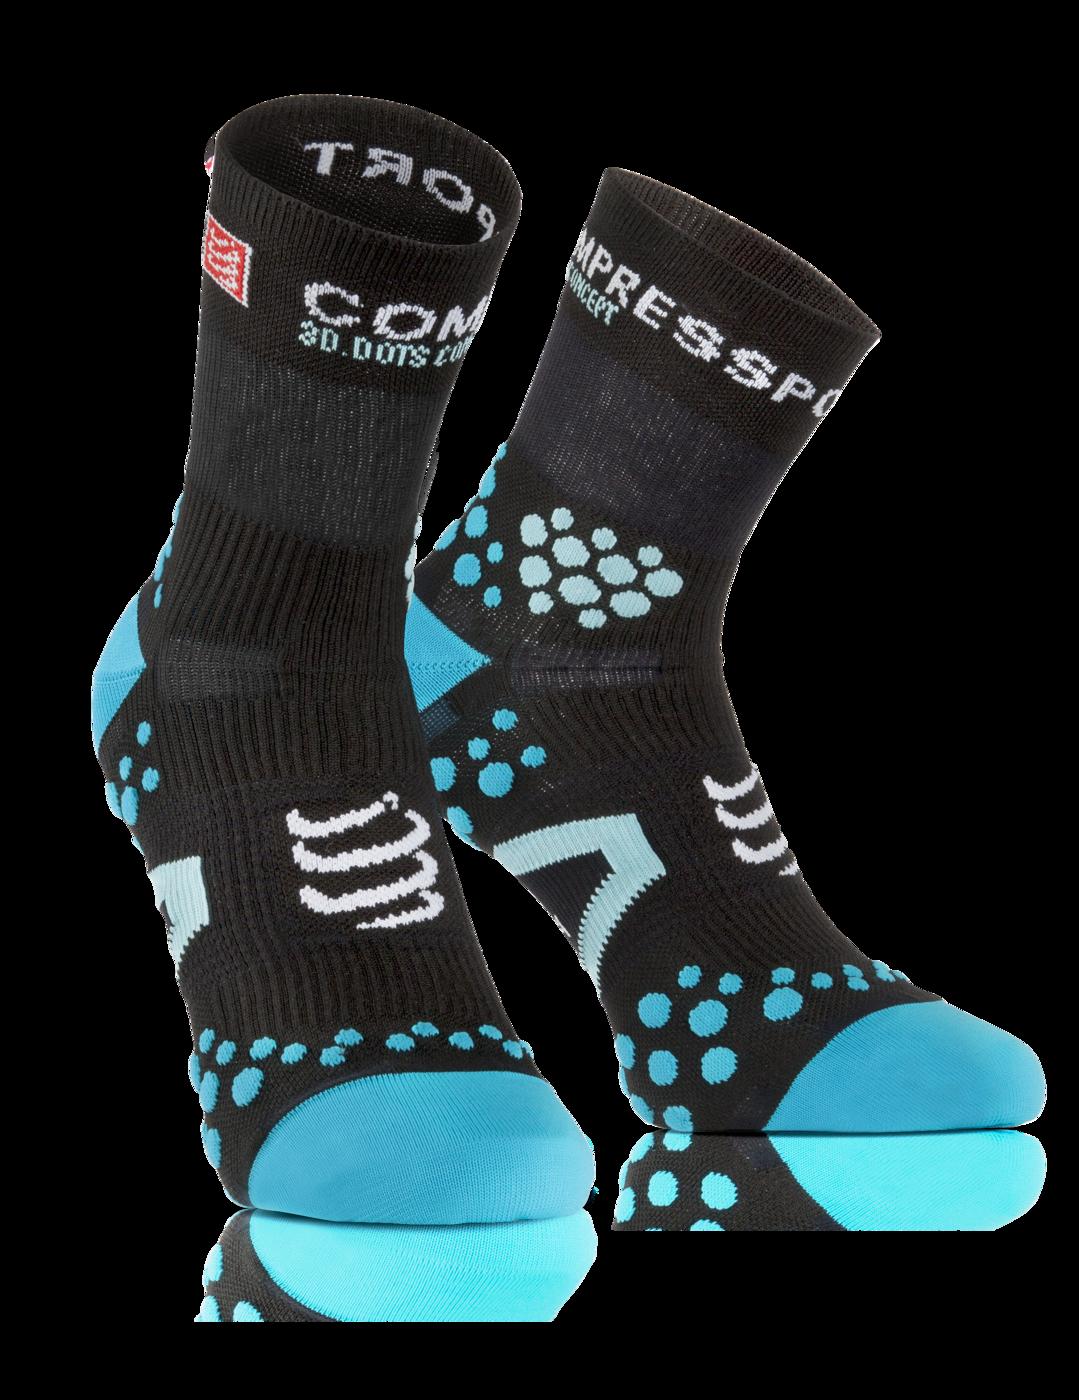 ProRacing Socks V2_1-RUN HIGH-Black-Blue